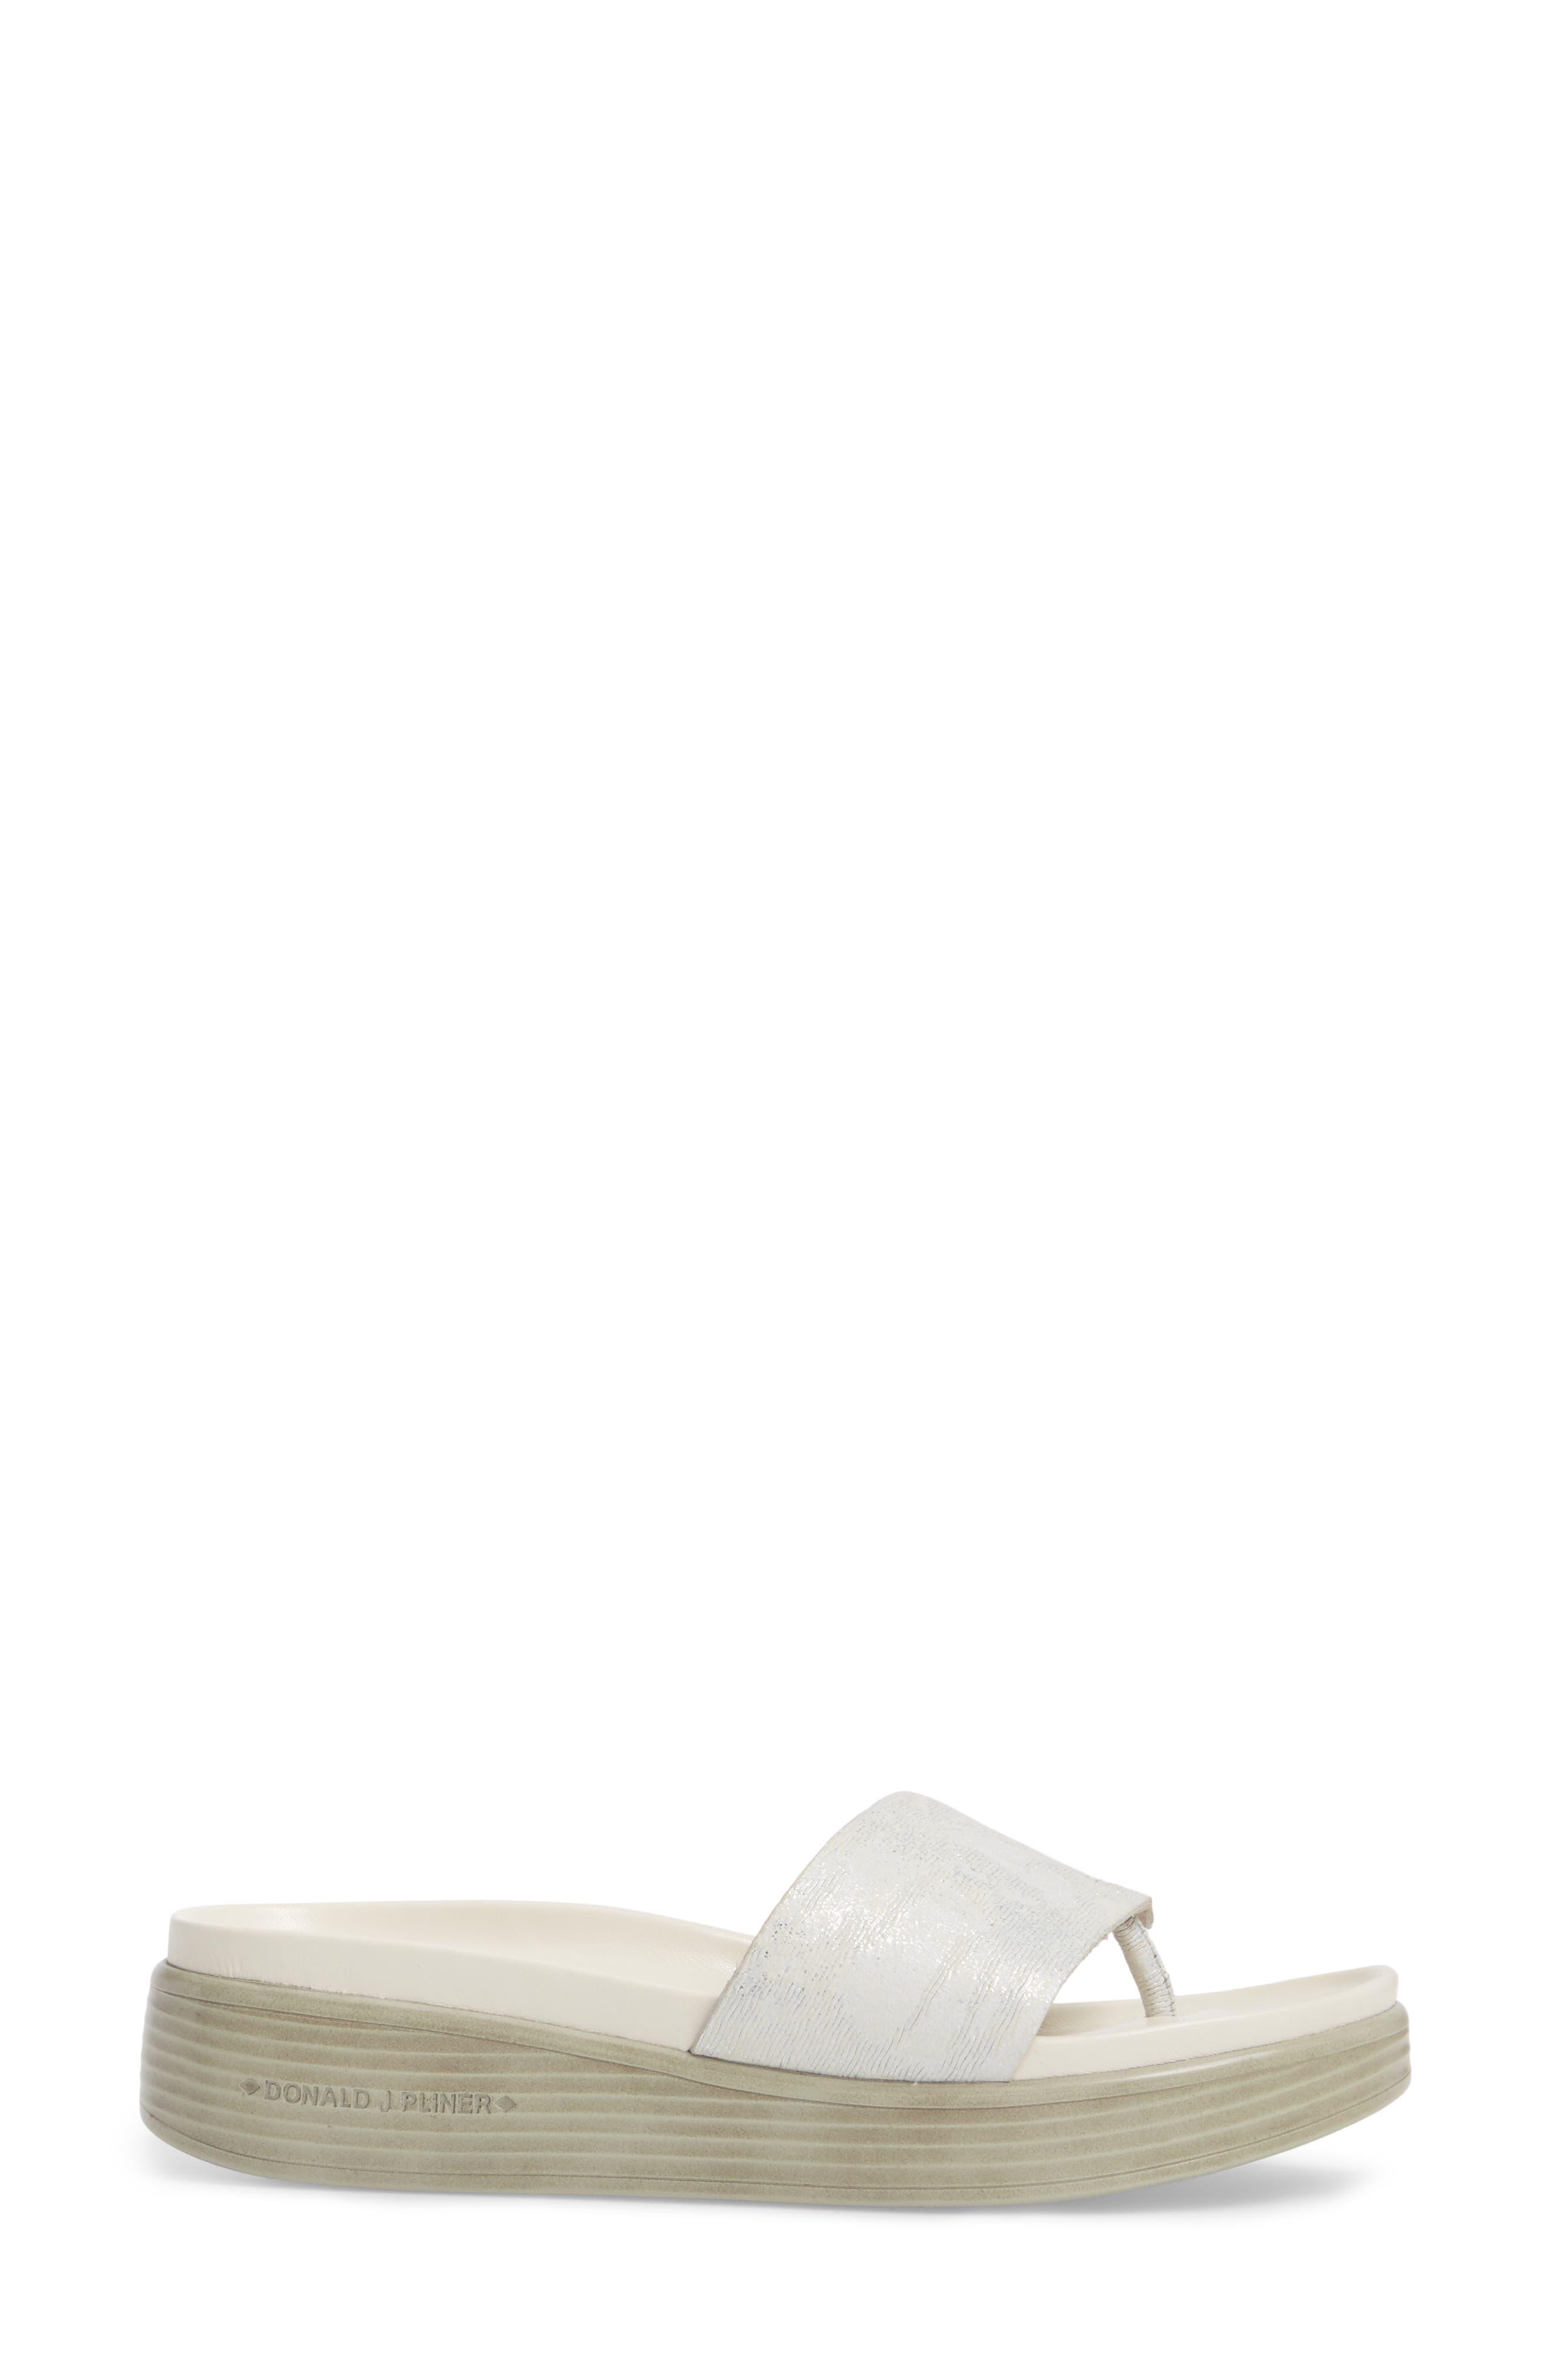 Fifi Slide Sandal,                             Alternate thumbnail 3, color,                             Silver Leather